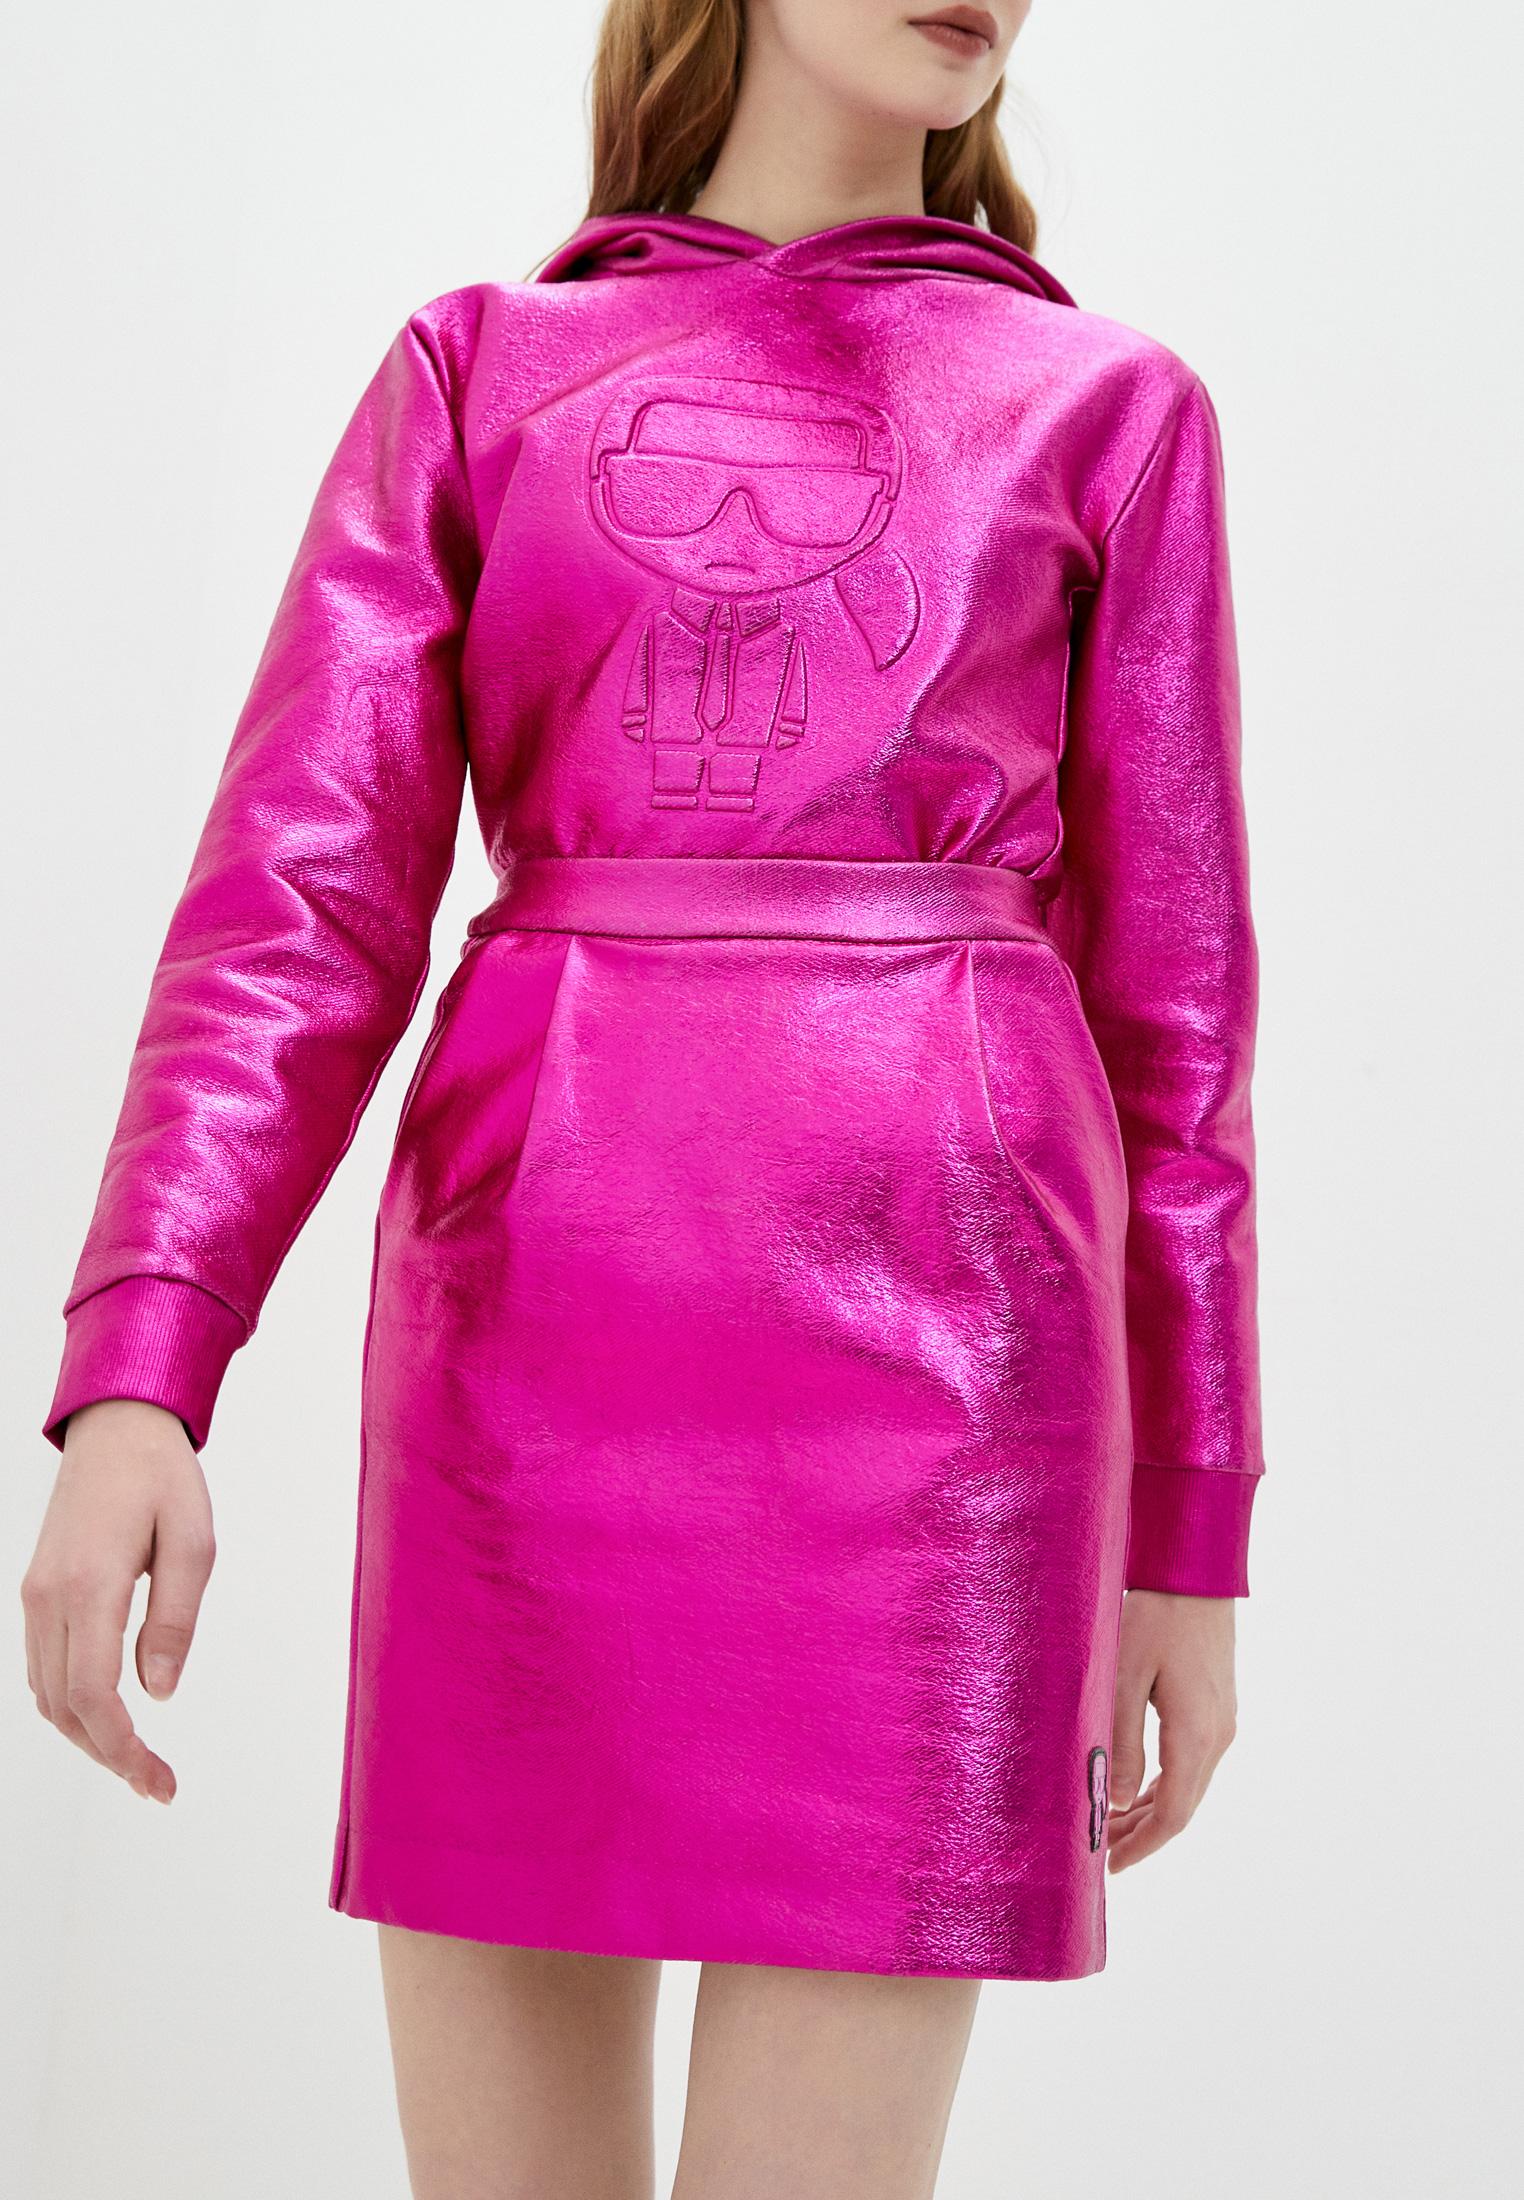 Прямая юбка Karl Lagerfeld Юбка Karl Lagerfeld